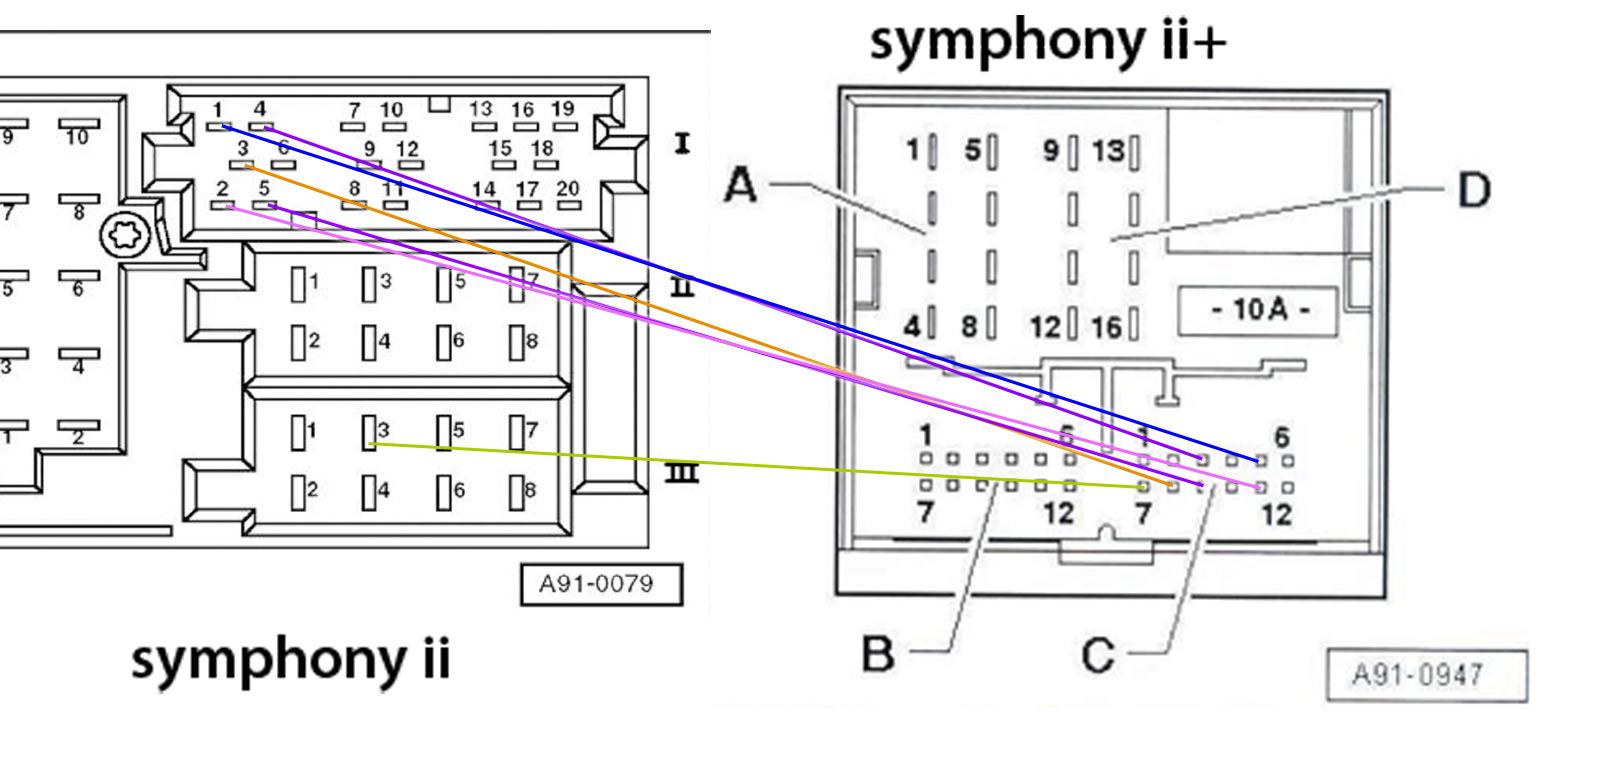 DB_0144] Audi Concert Us Stereo Wiring Diagramjpg Wiring Diagram   Audi Concert Radio Wiring Diagram      Gentot Aidew Illuminateatx Librar Wiring 101